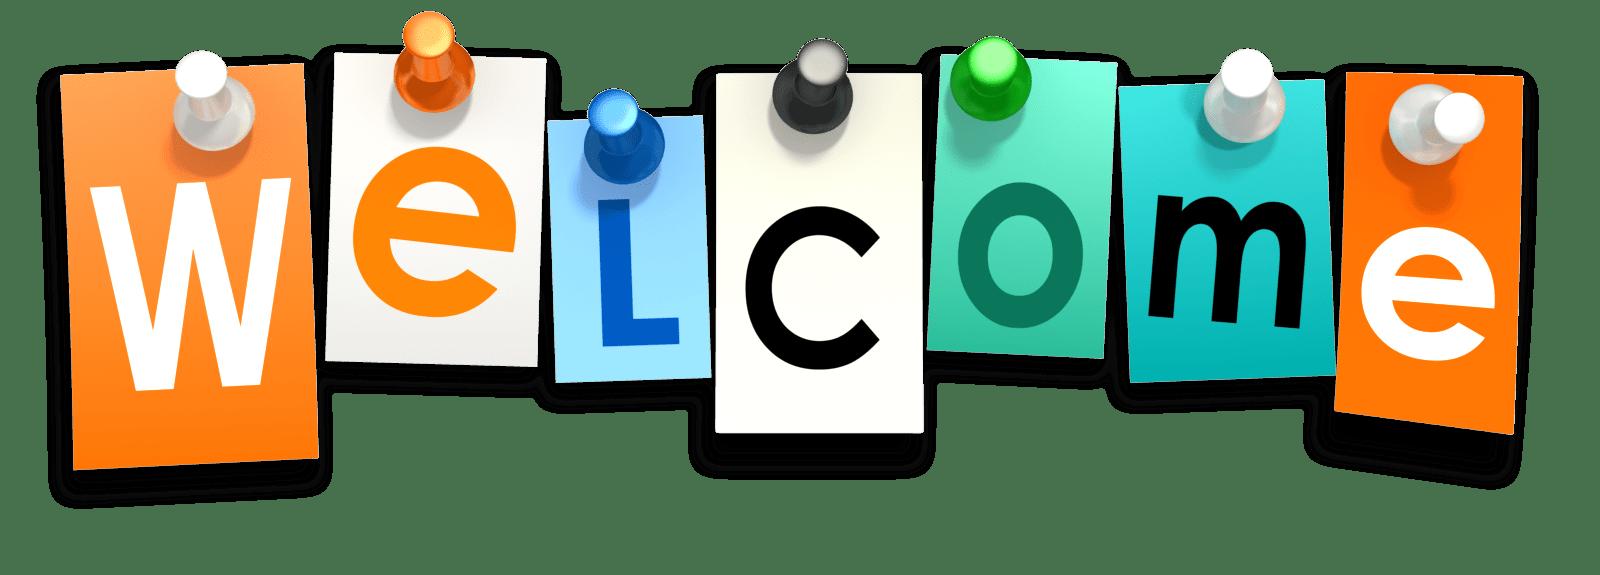 welcome_thumb_tacks_1600_clr_9661.png